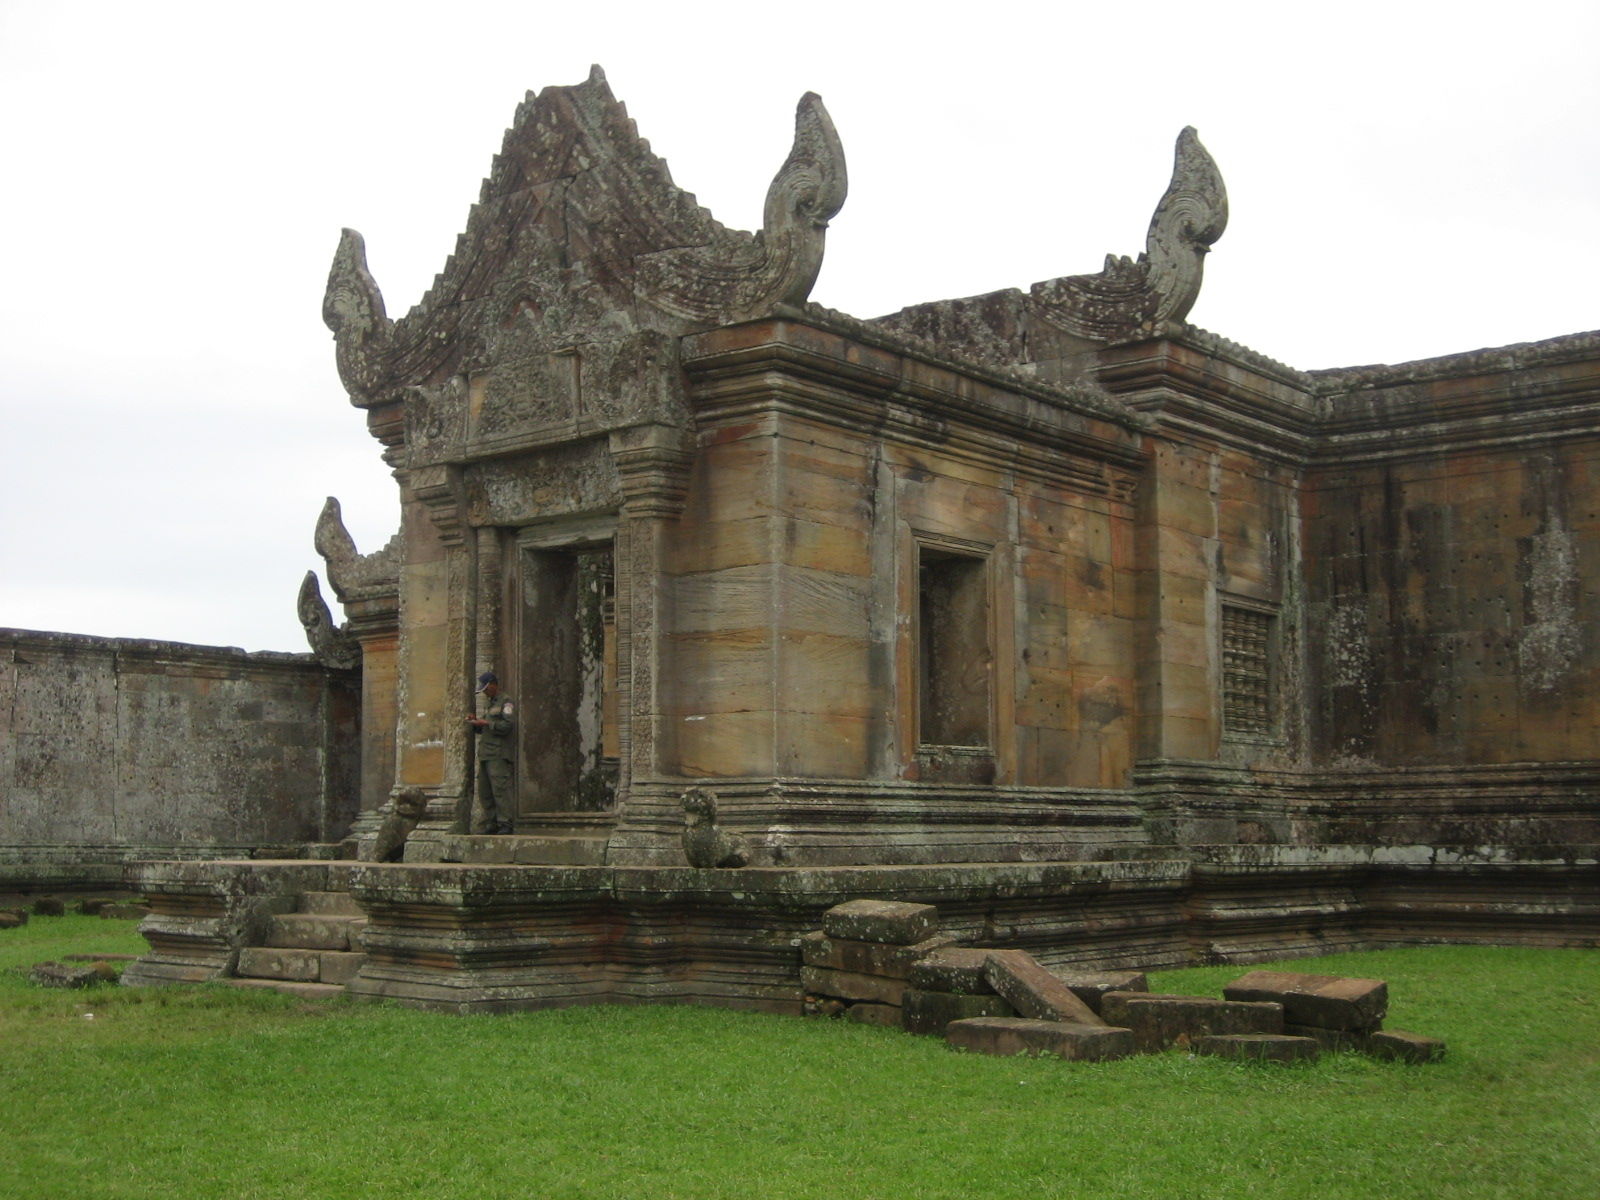 Preah Vihear, cc image